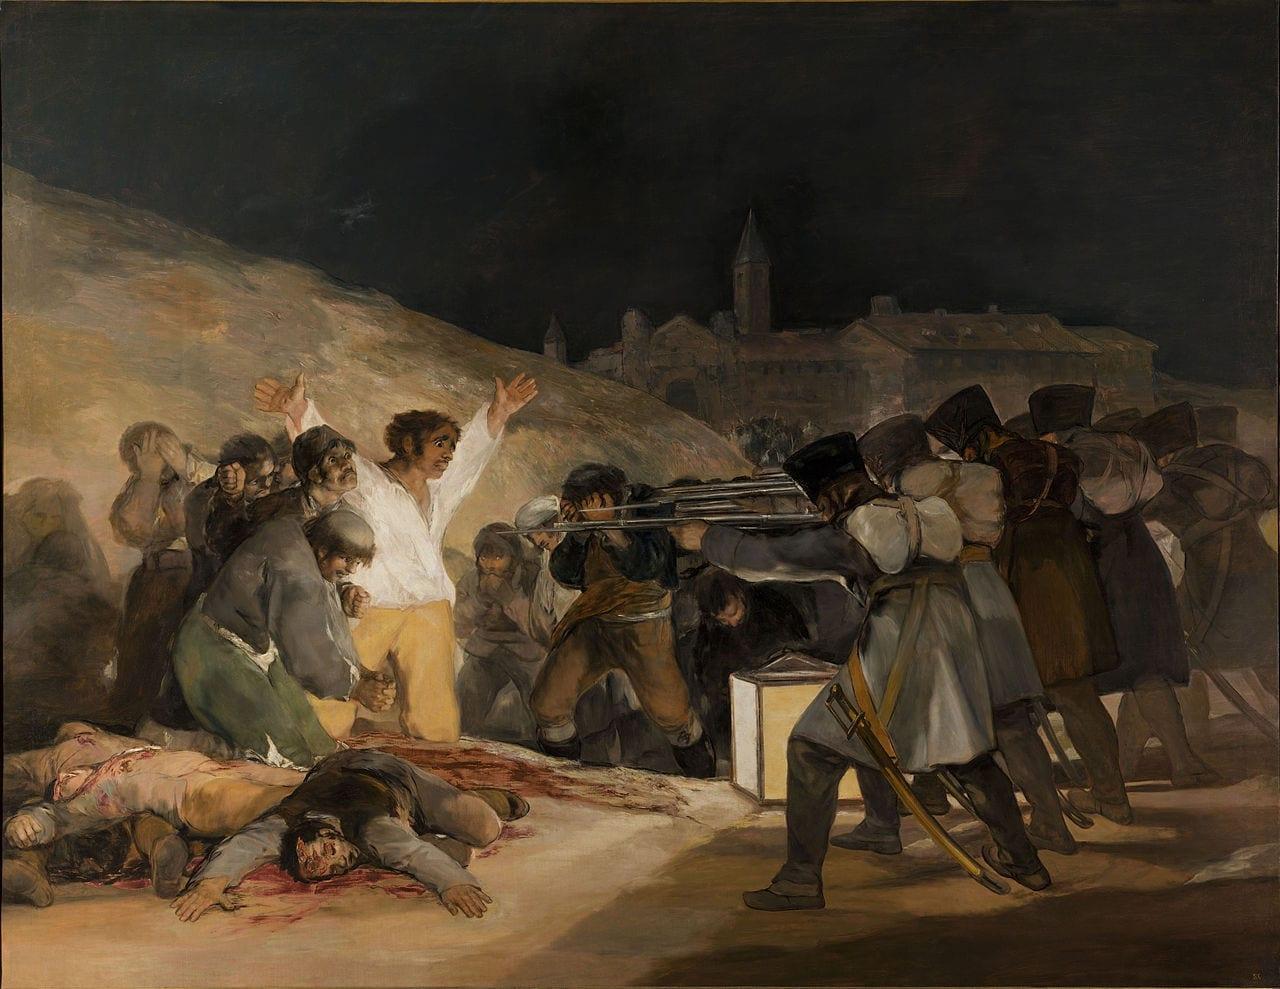 Perceptions of War: Goya's 'Third of May'